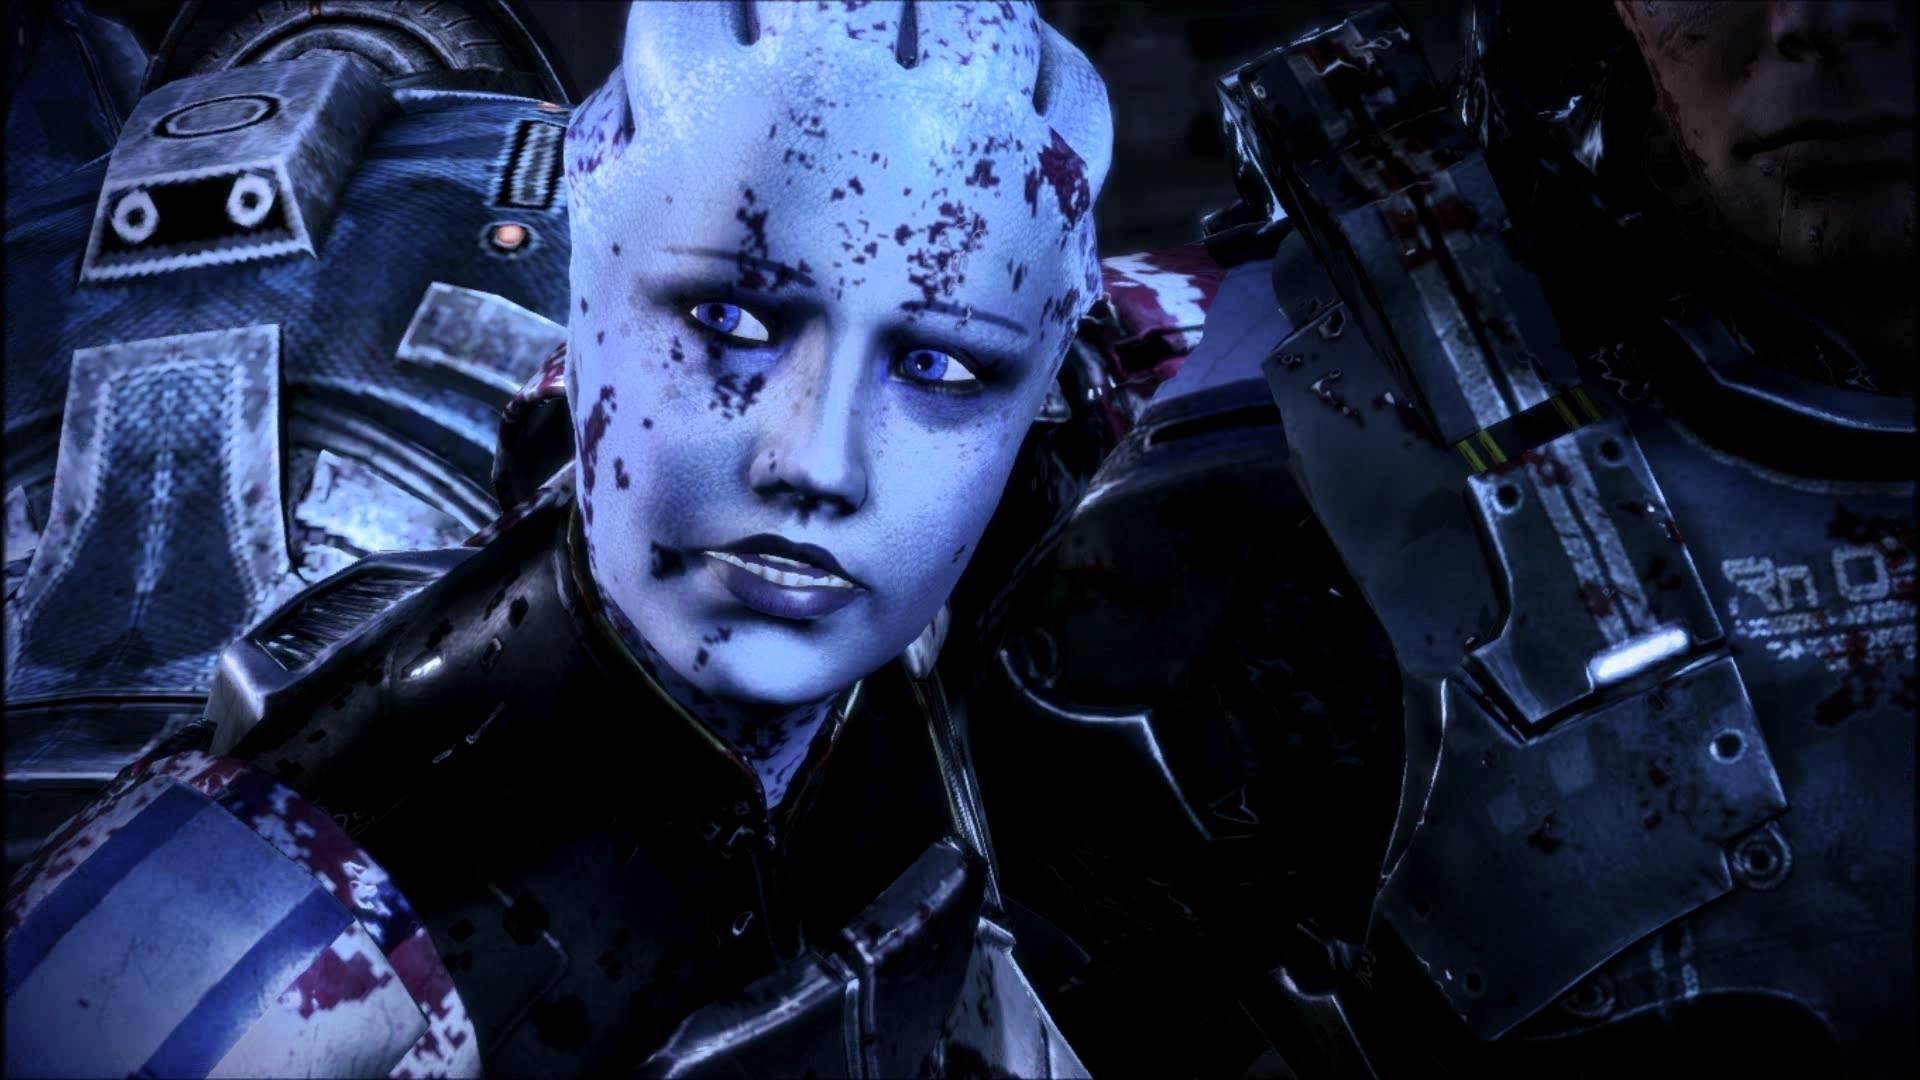 Mass Effect 3 Extended Cut Liara + Femshep LI scene at beam (HD) – YouTube